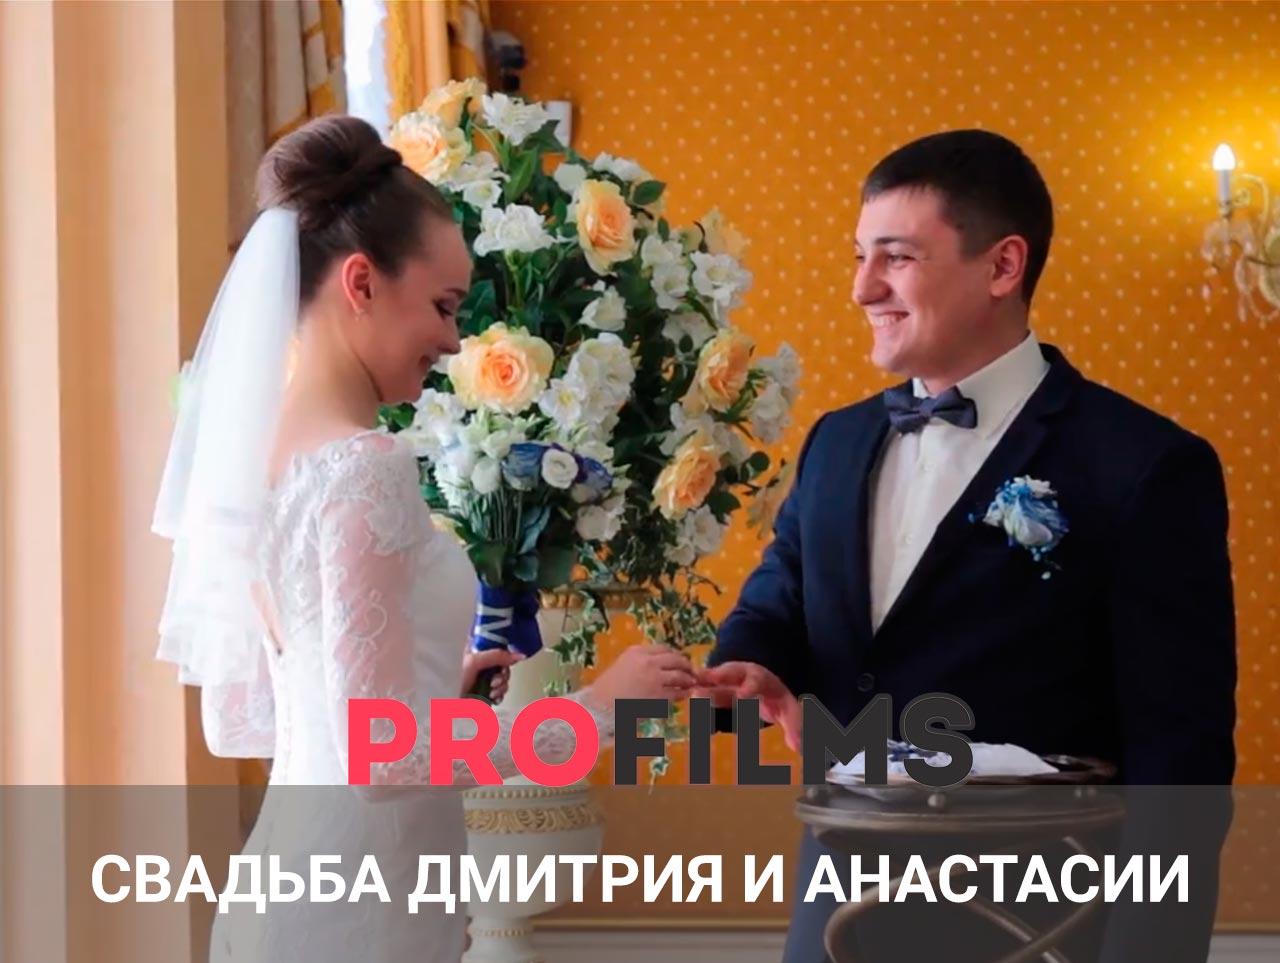 Свадьба Дмитрия и Анастасии